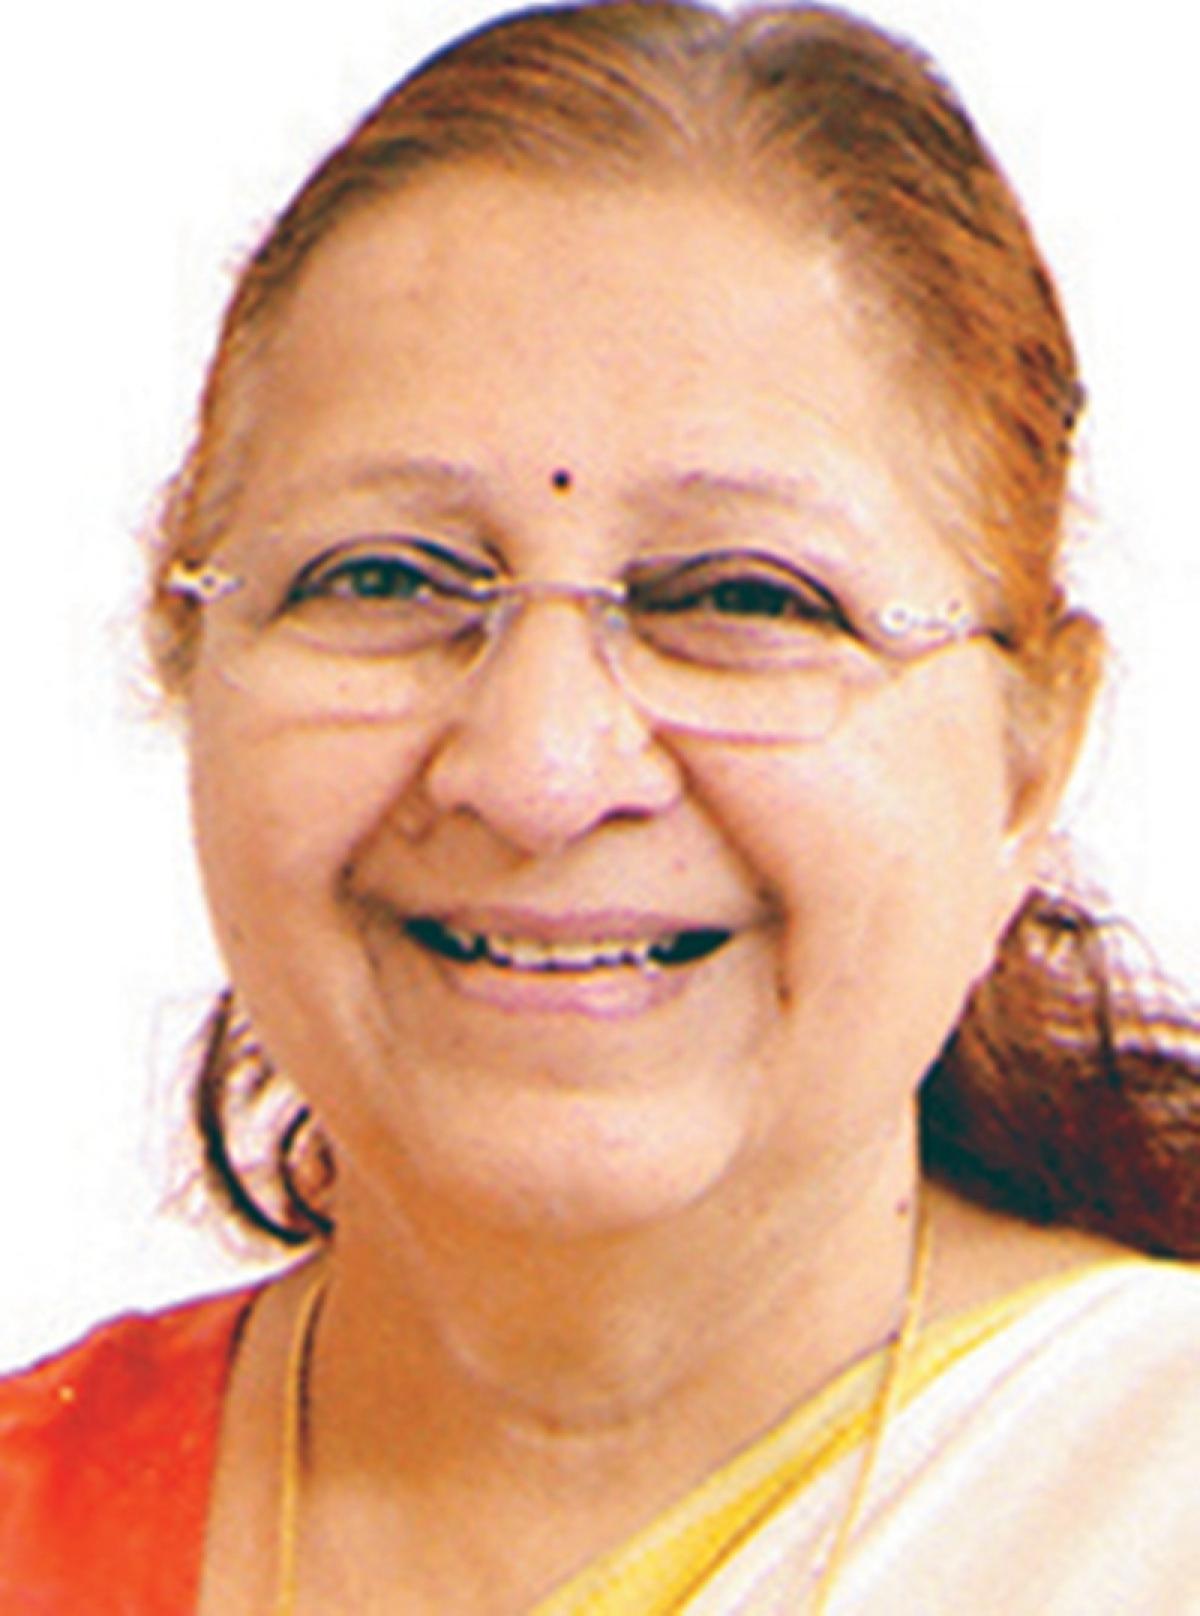 Indore: Pak buckled under pressure, says Tai